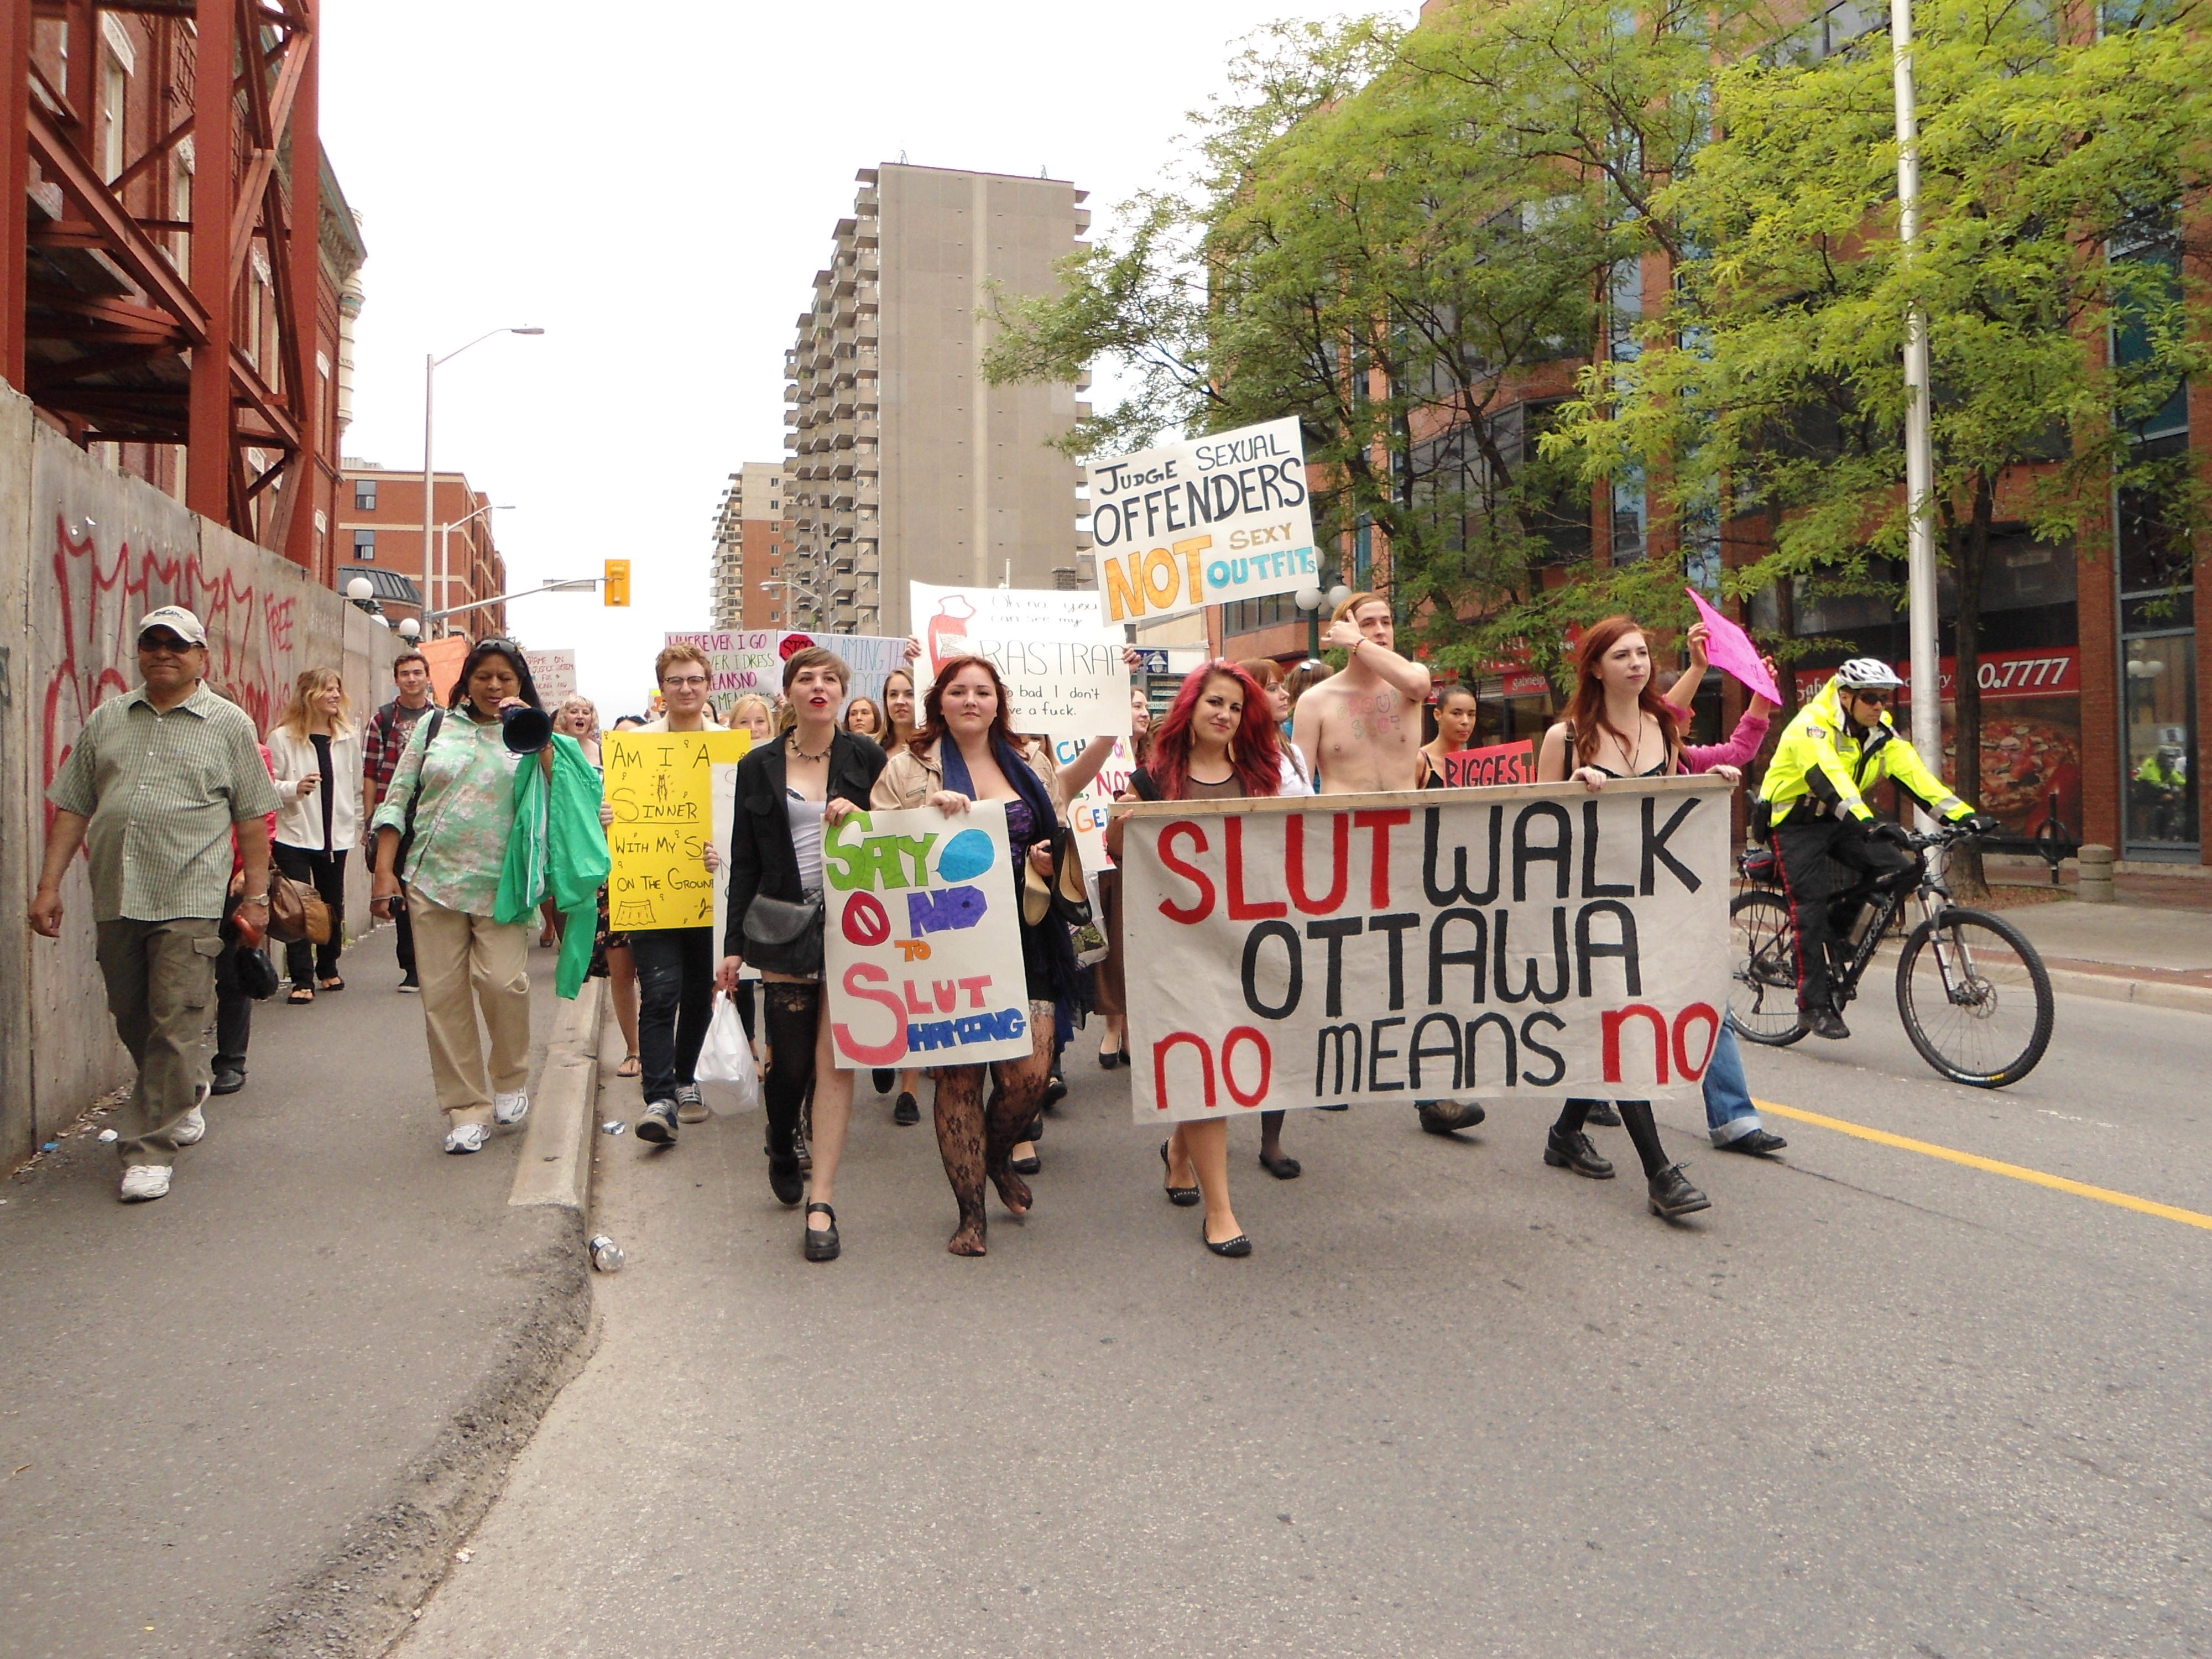 Think, Toronto slut walk photos